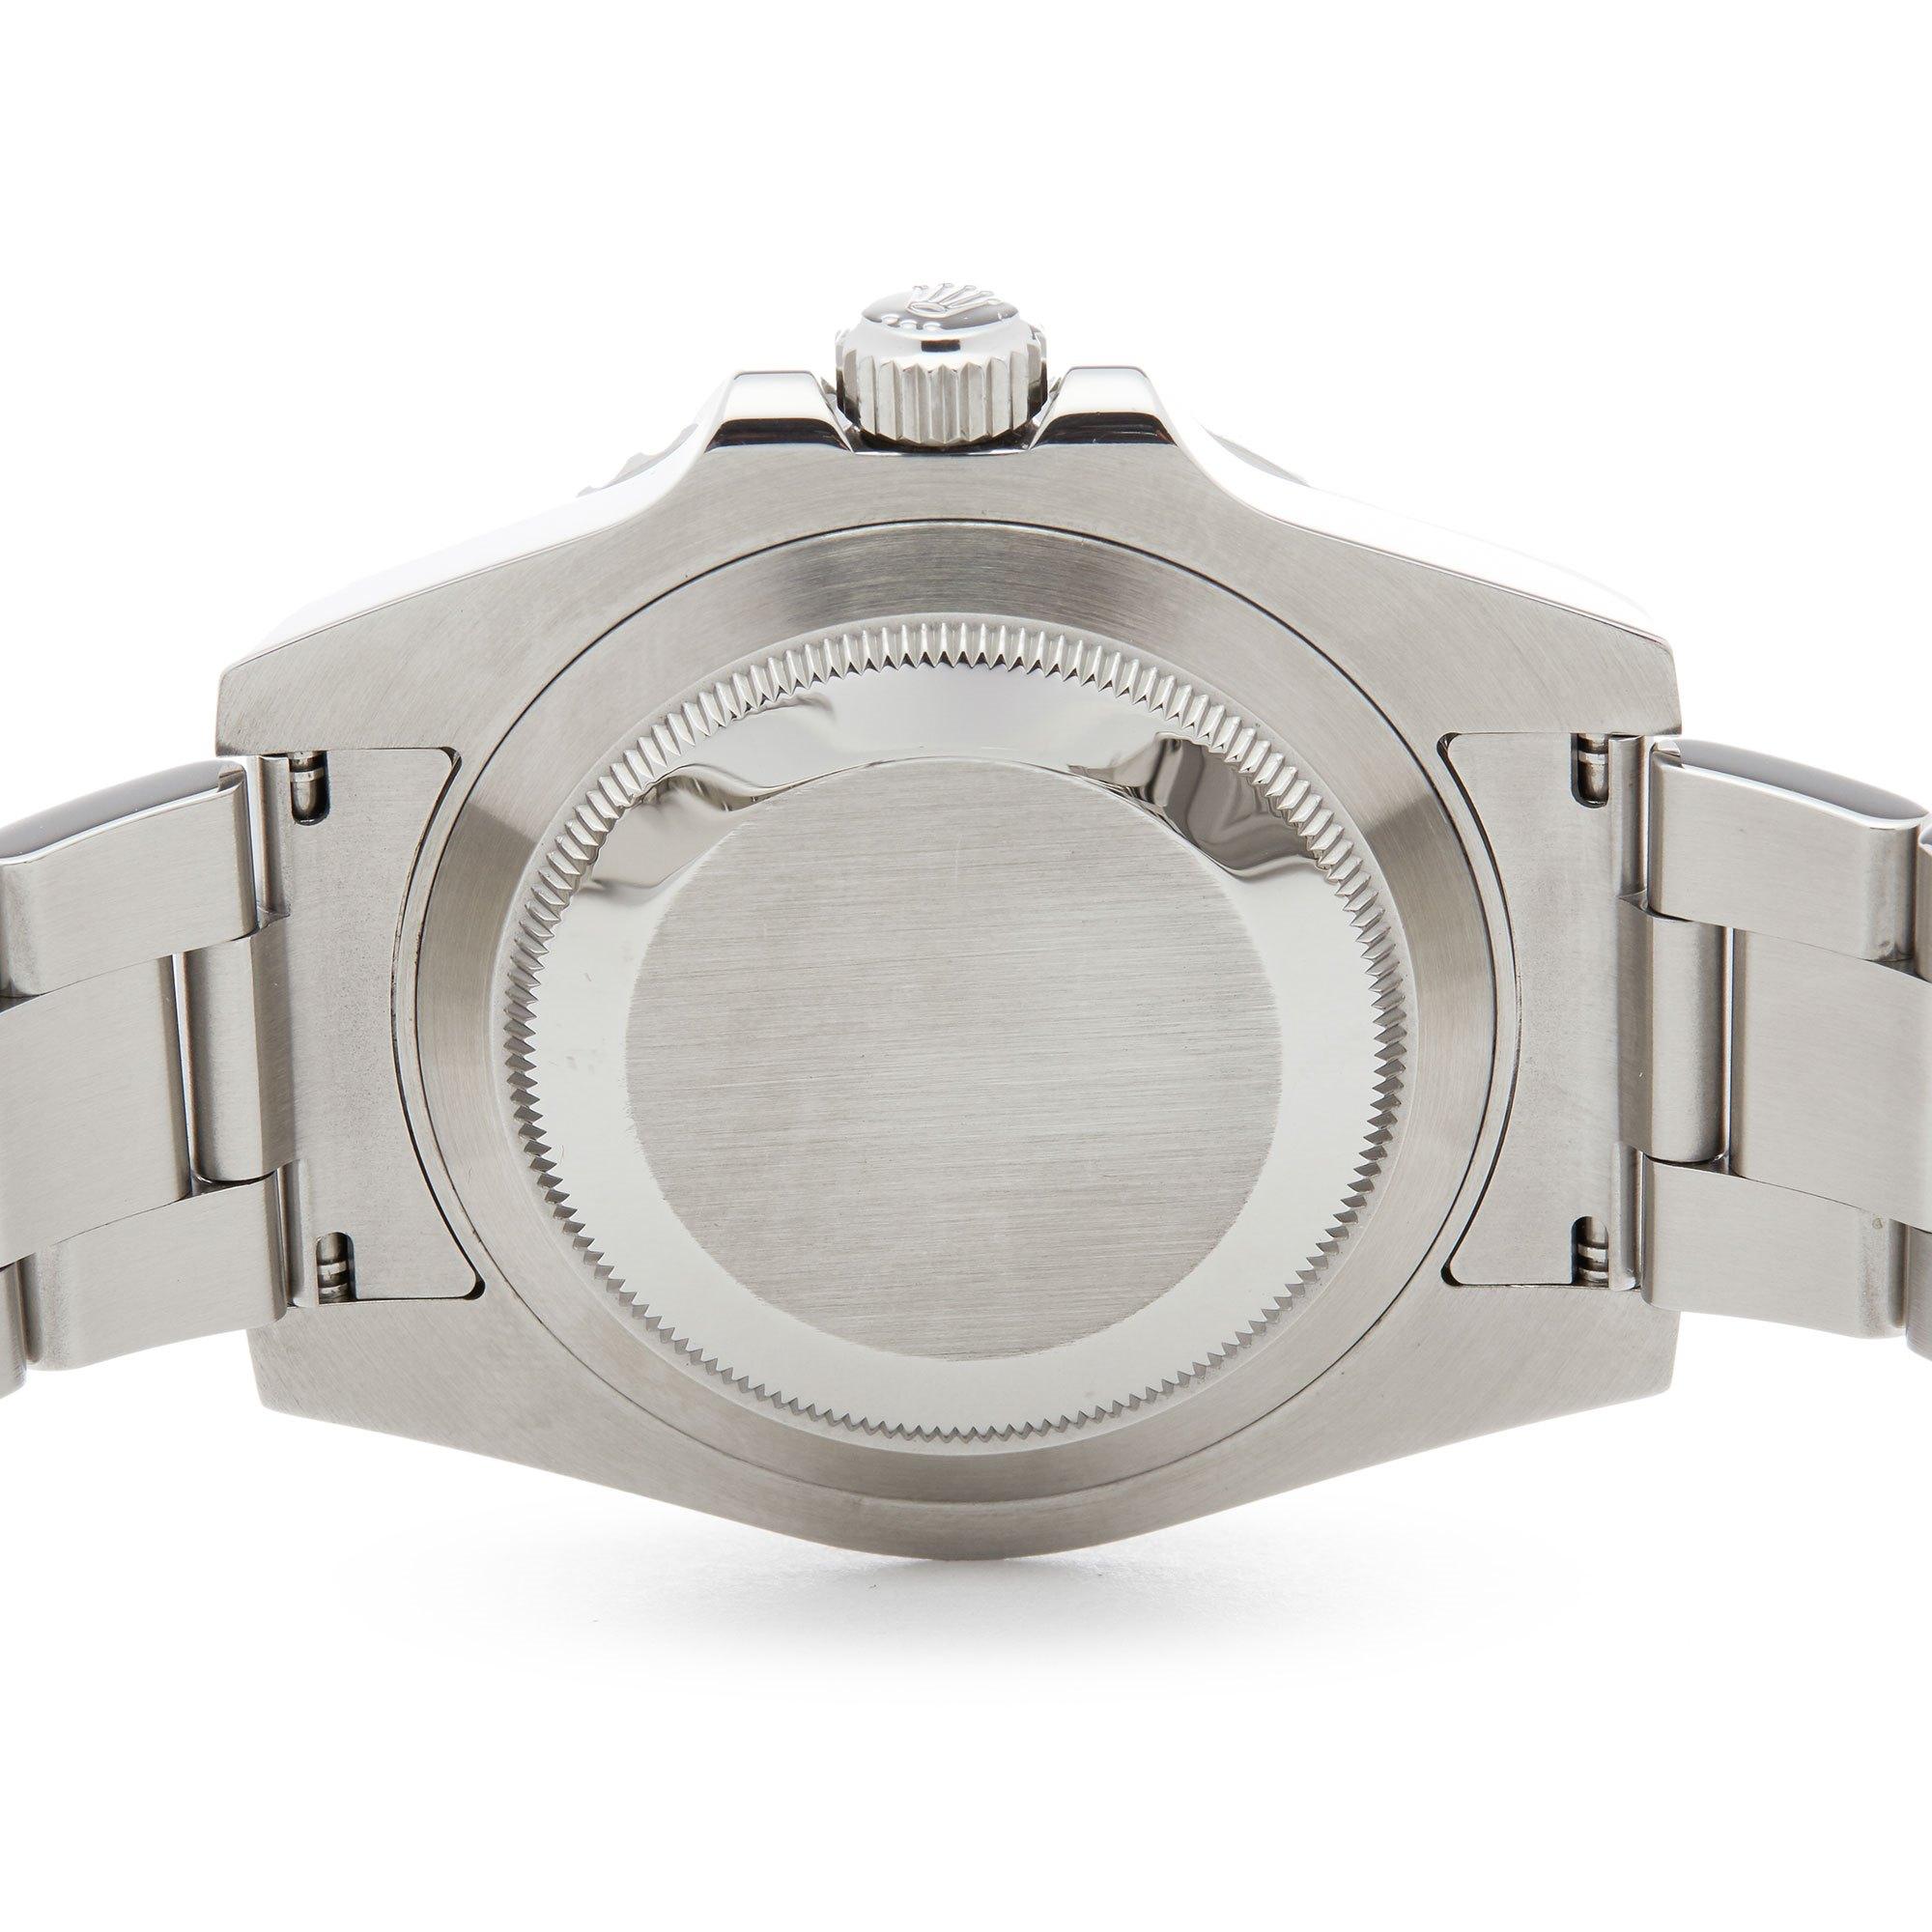 Rolex Submariner No Date Stainless Steel 114060